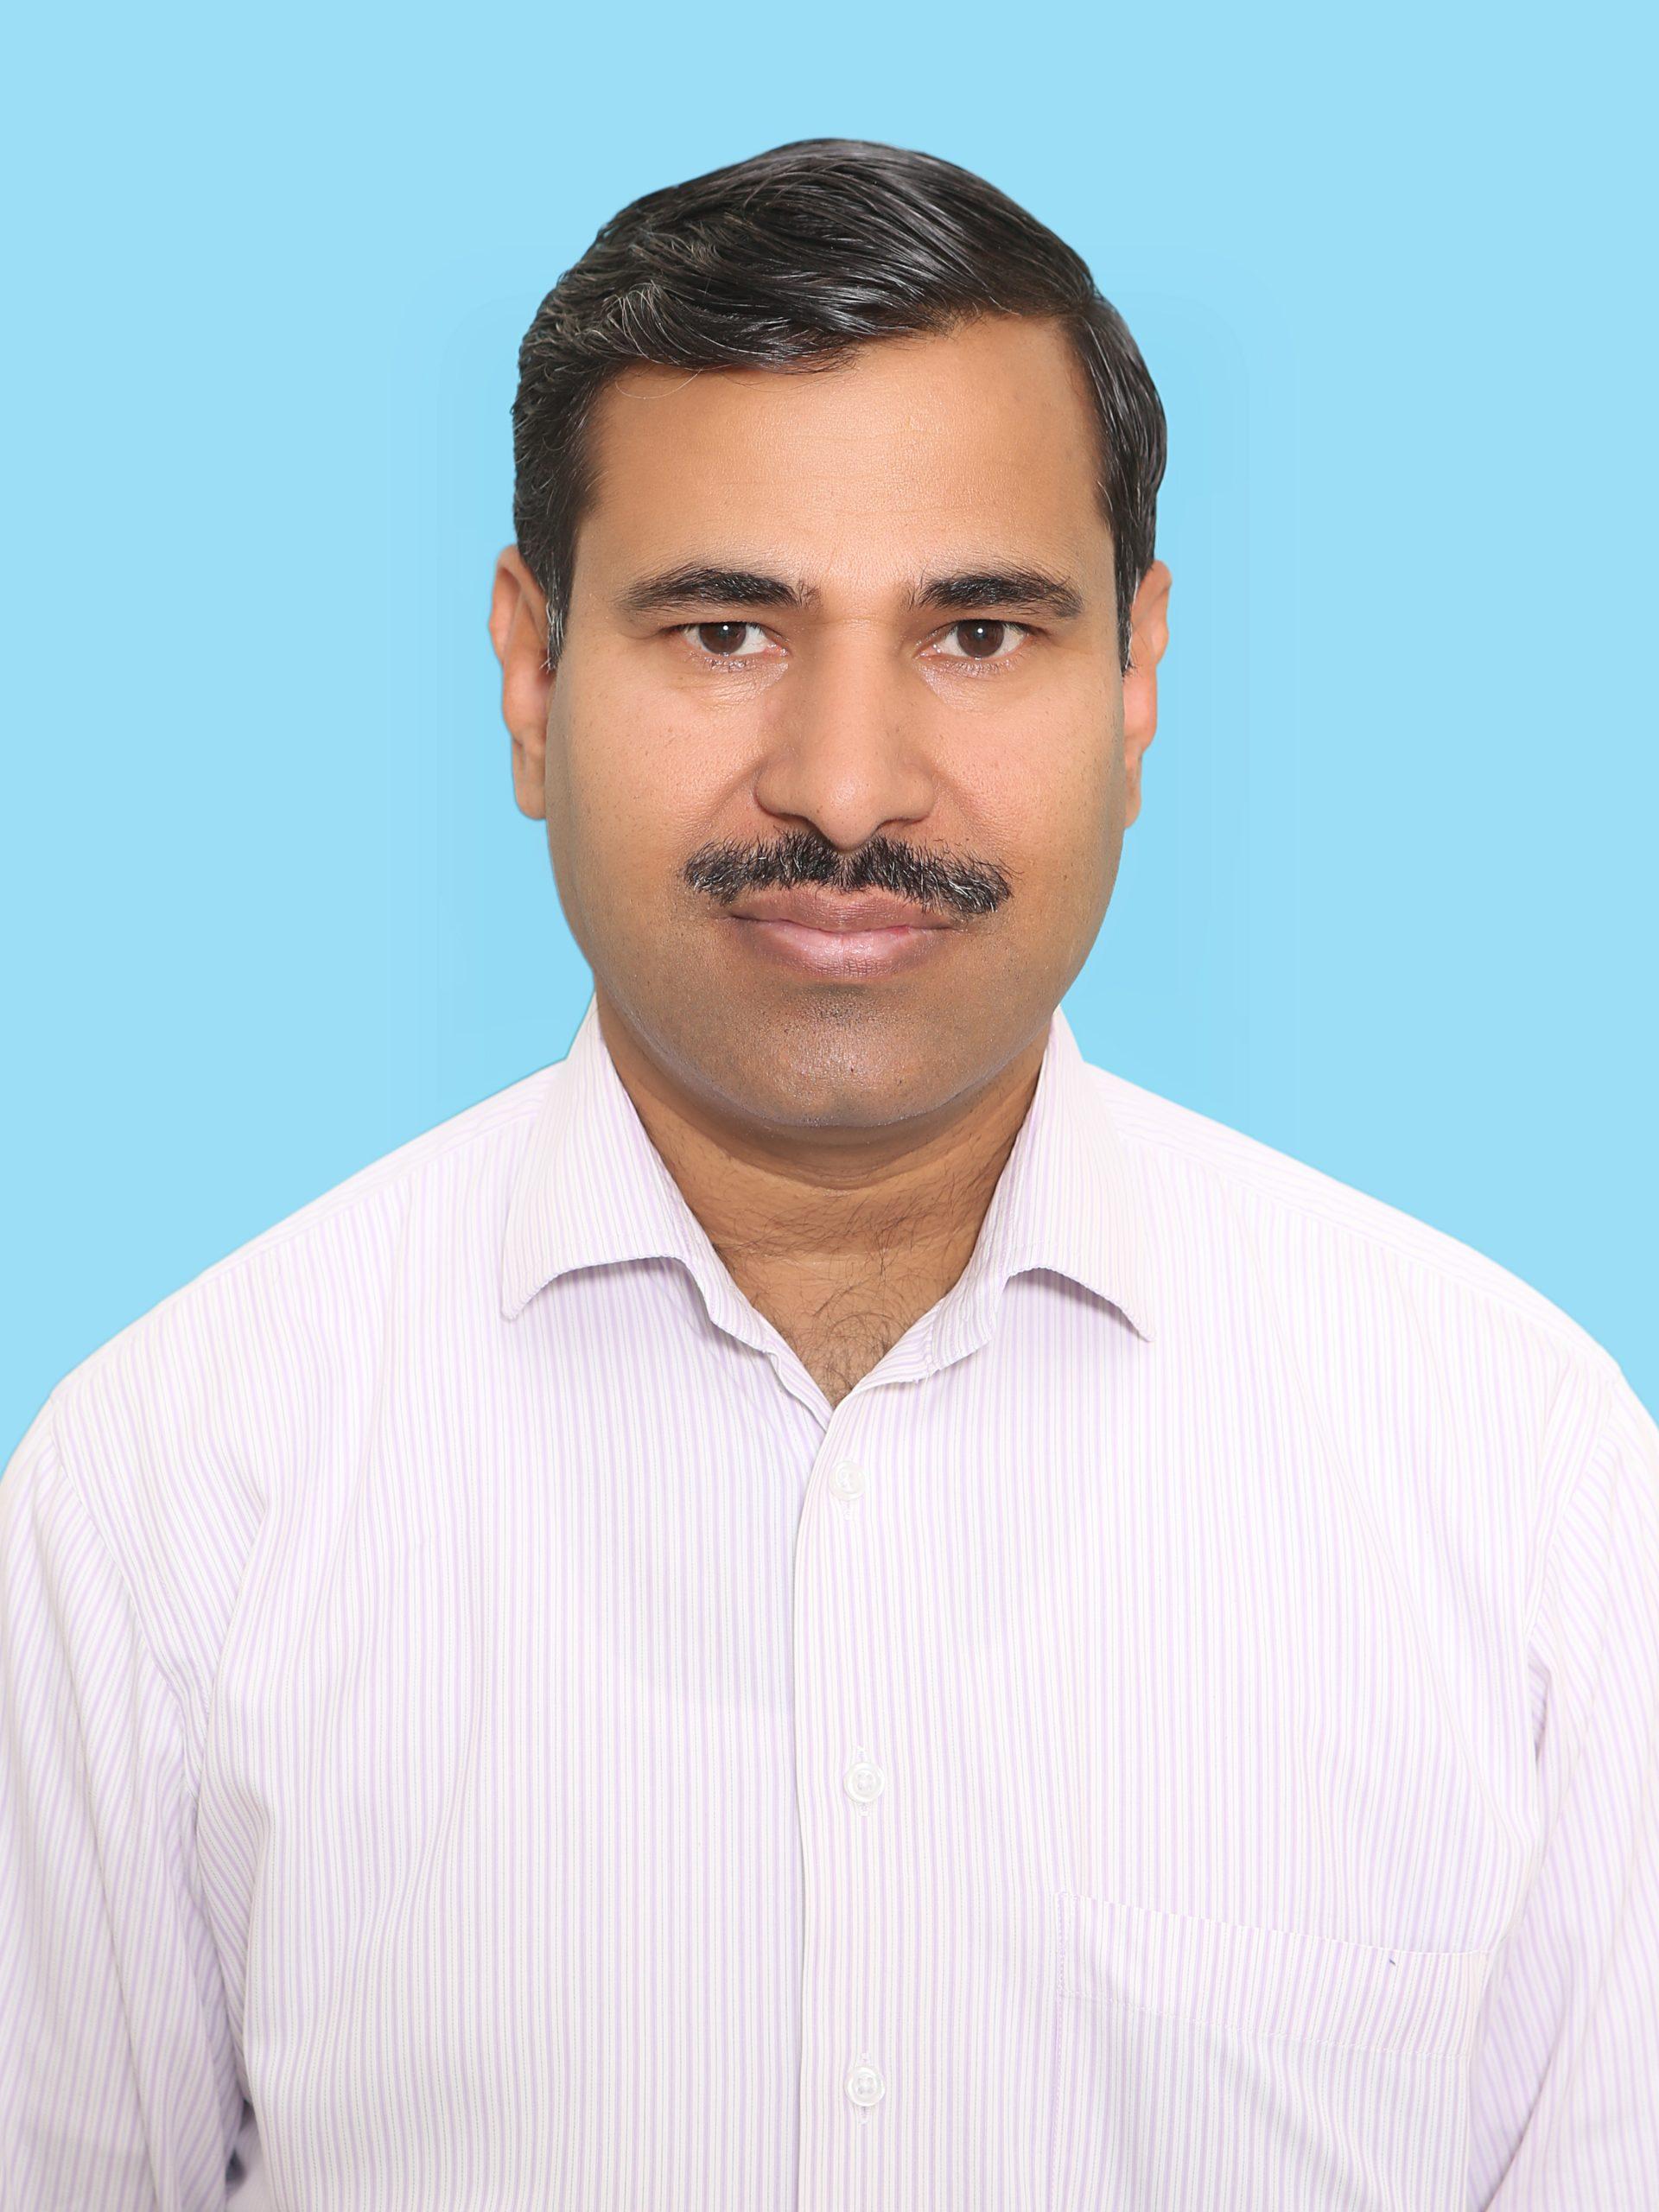 Dr. Sher Ali